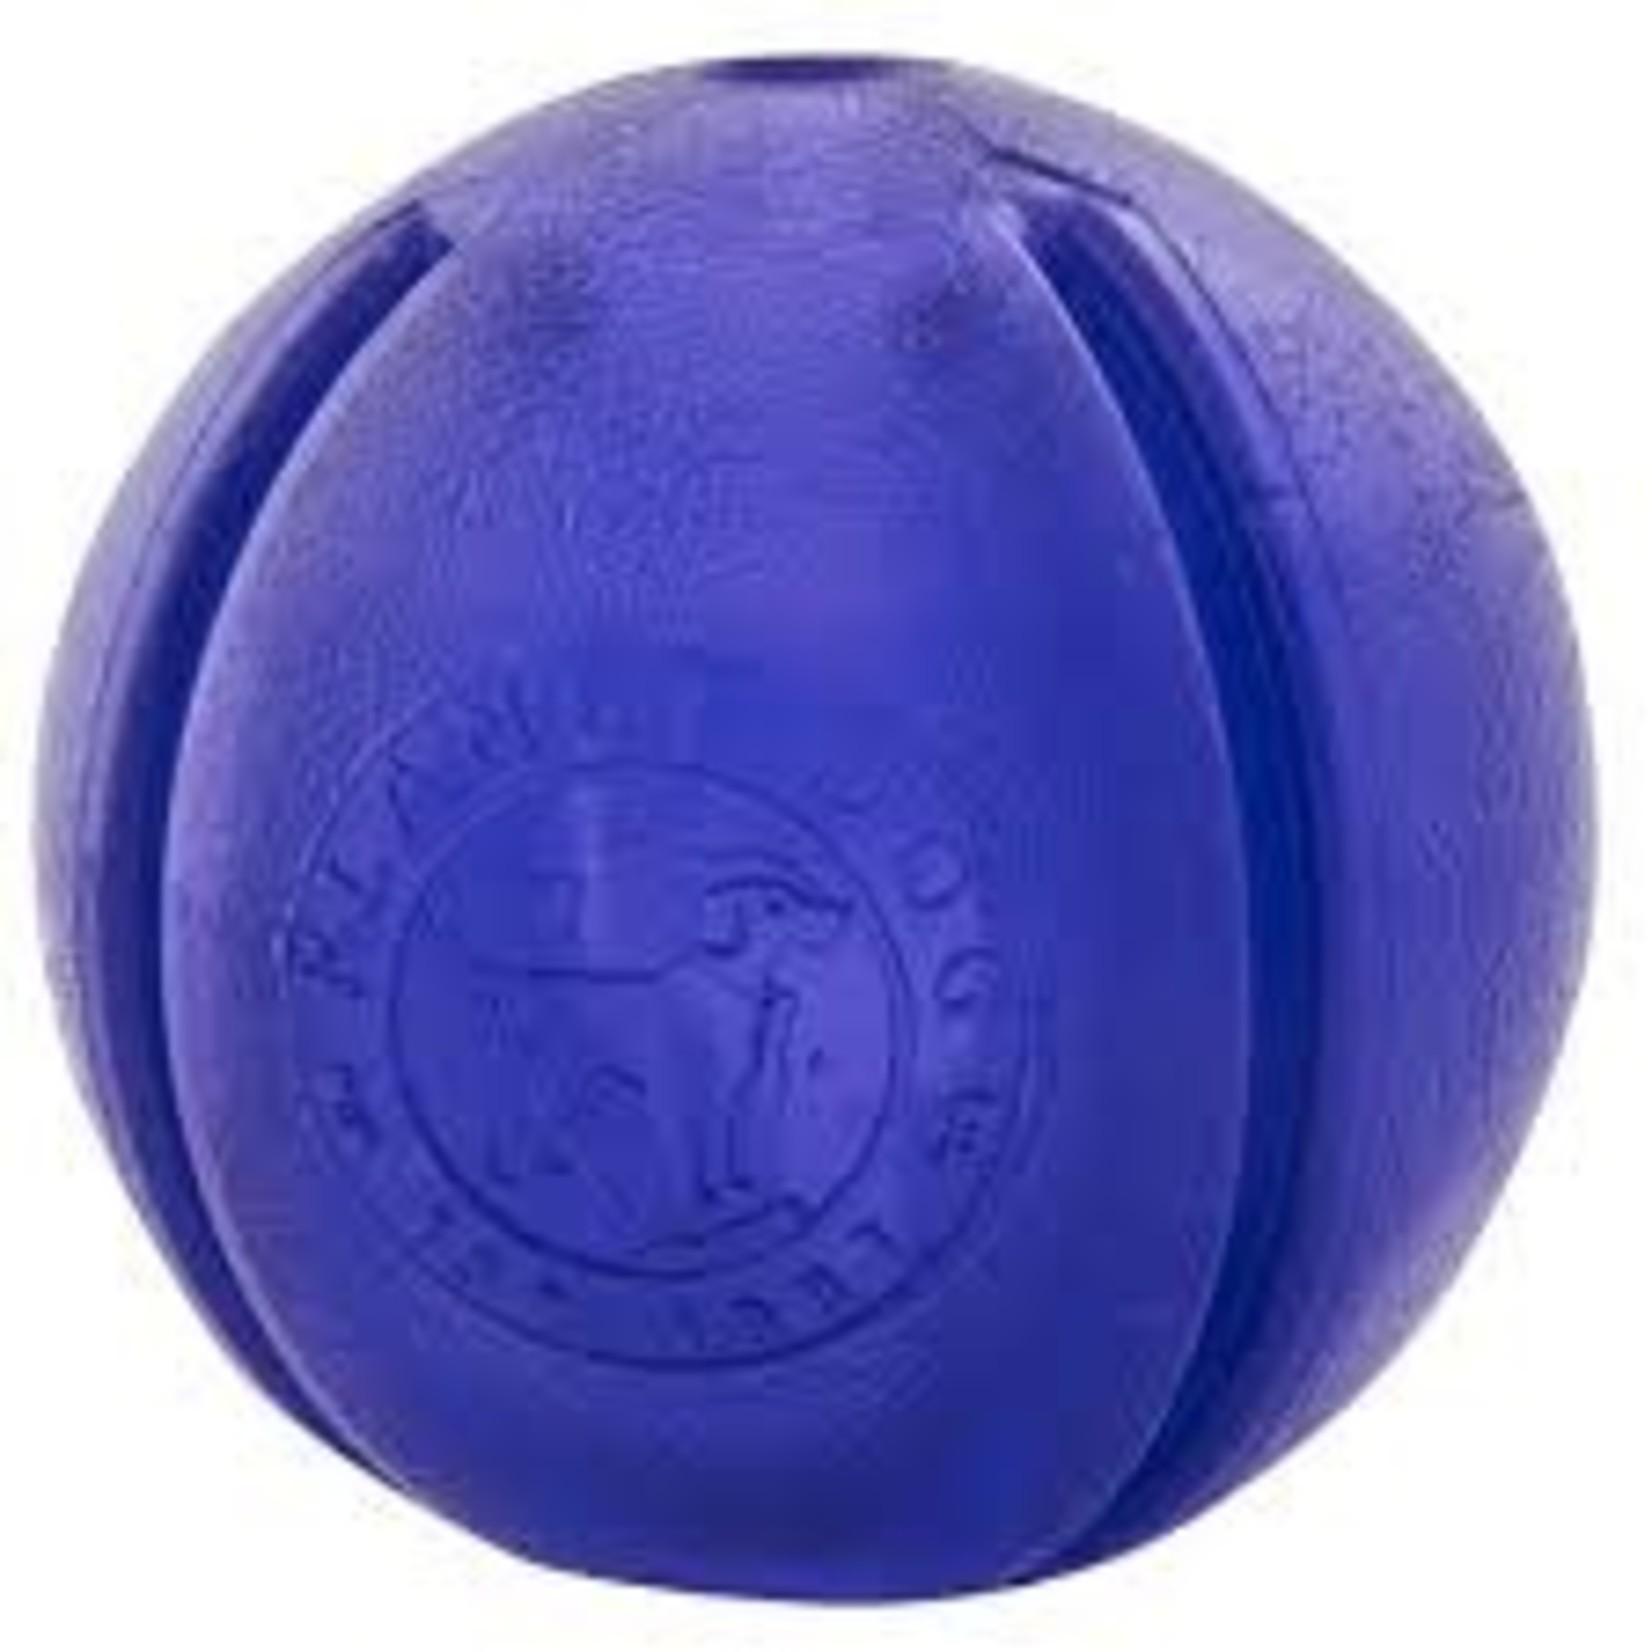 Planet Dog Planet Dog Guru Ball Blue